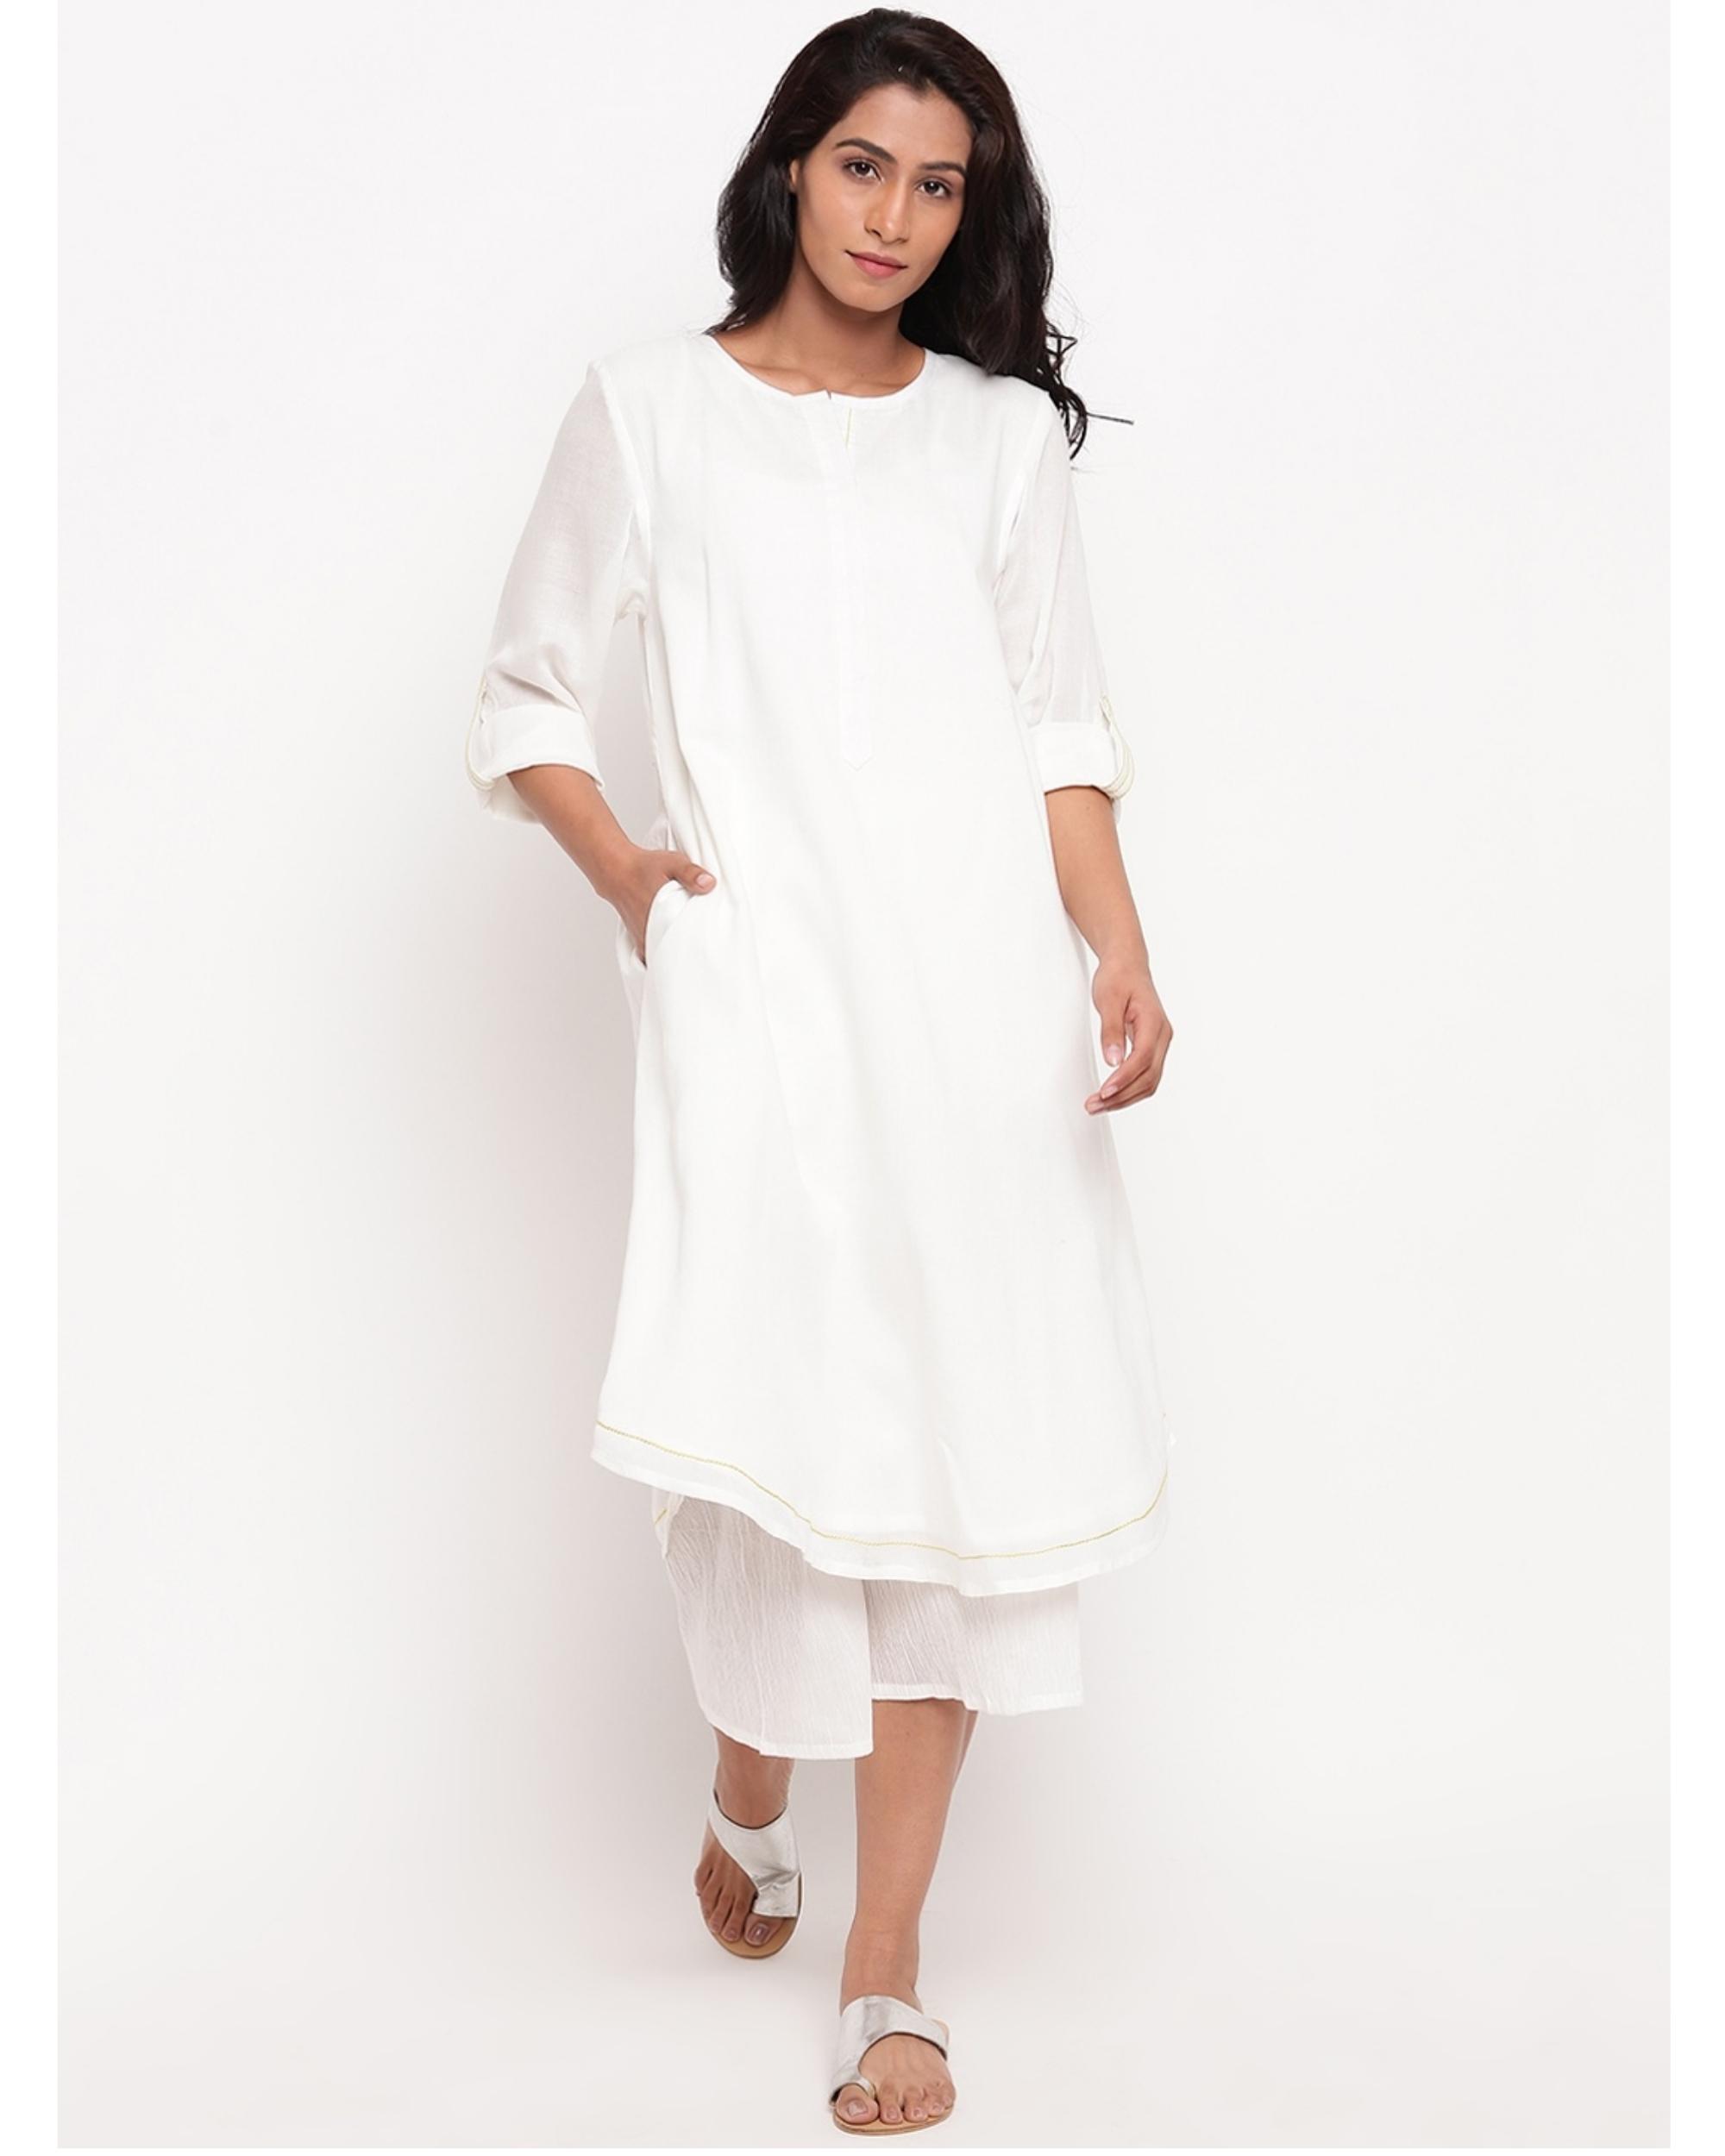 White flap sleeve kurta with pockets